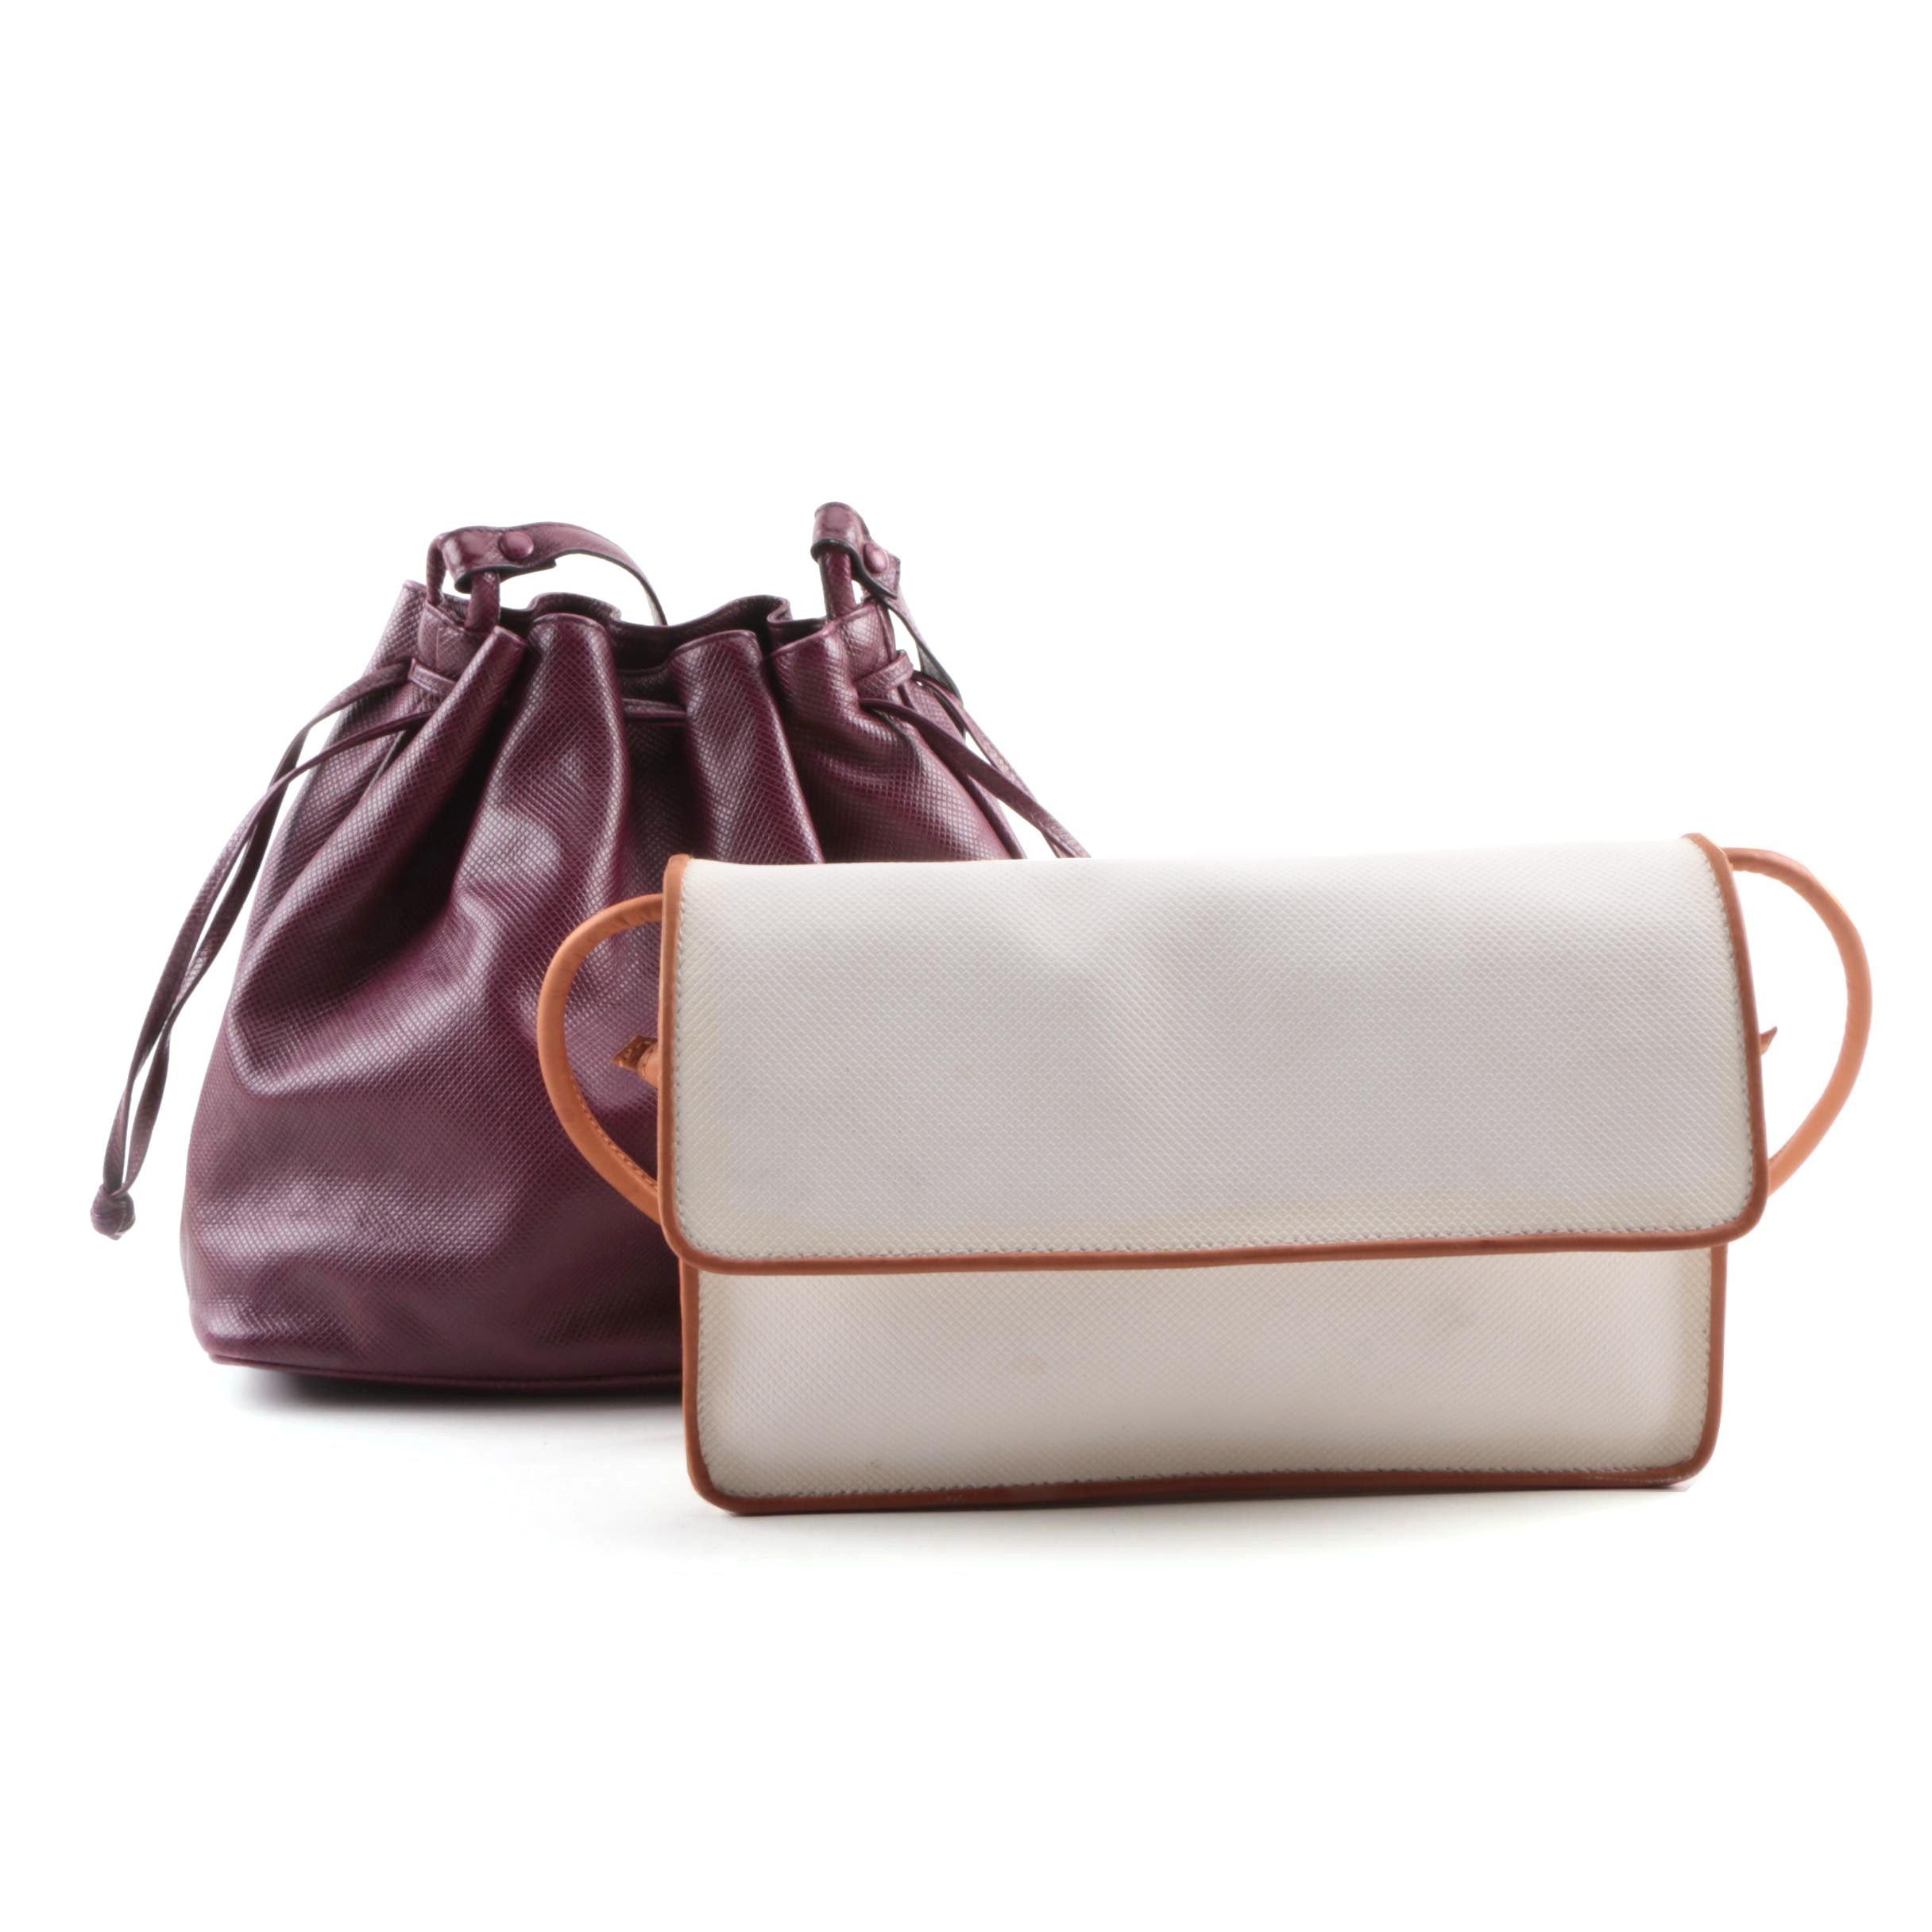 Bottega Veneta Coated Canvas and Leather Shoulder Bags